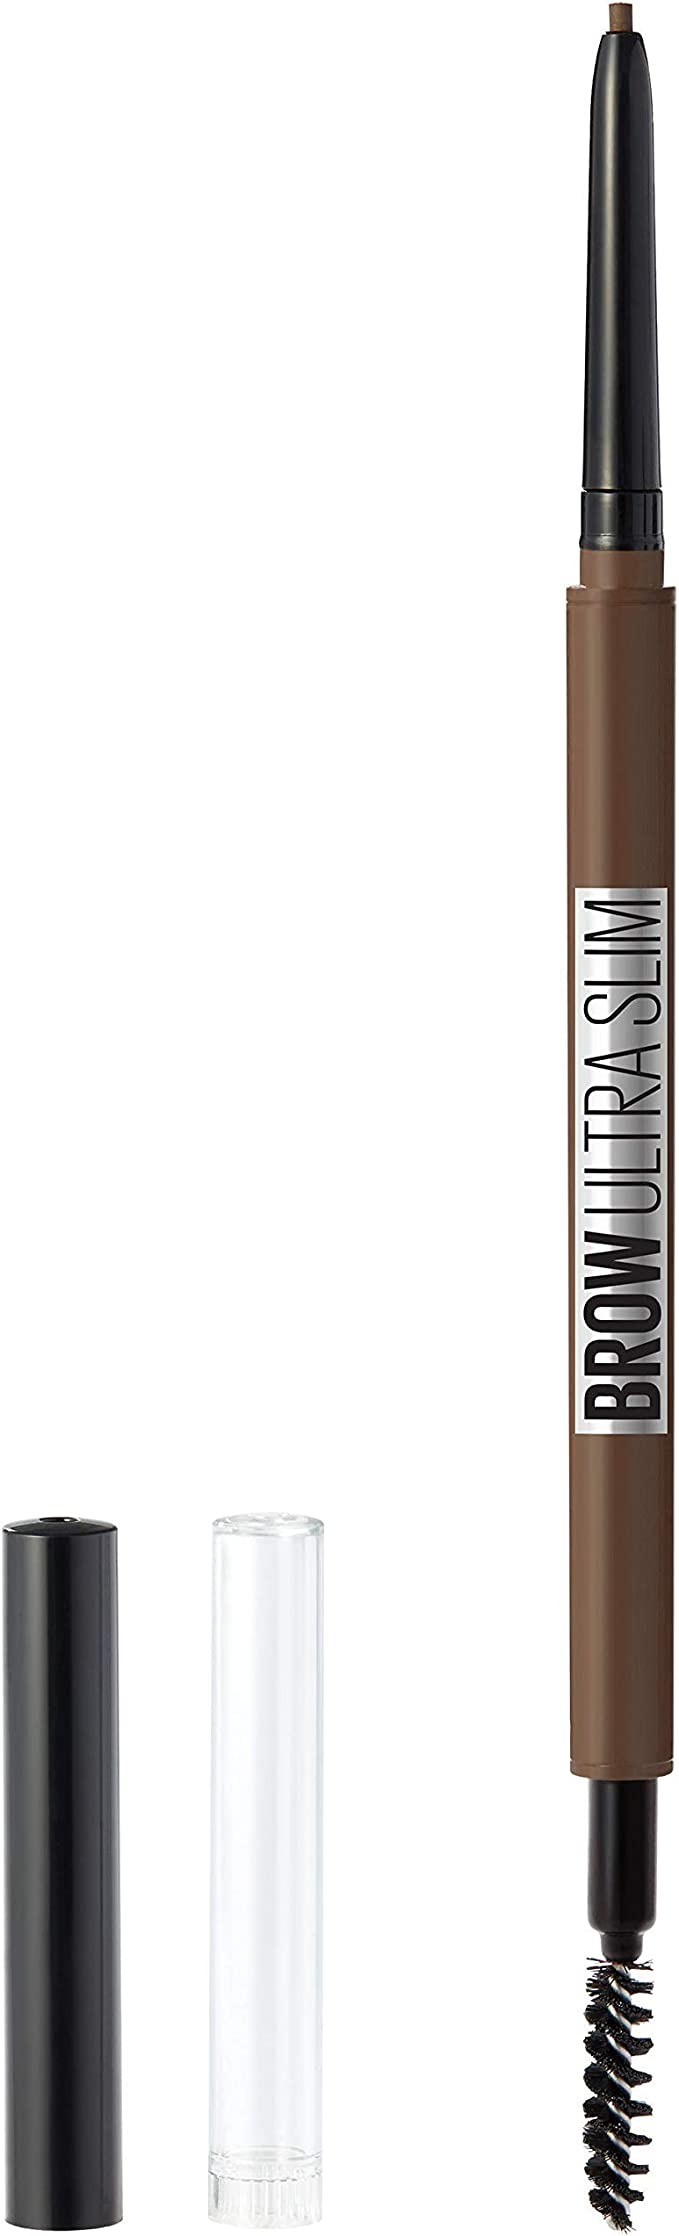 Maybelline New York Brow Slim Lápiz automático preciso Medium Brown 04